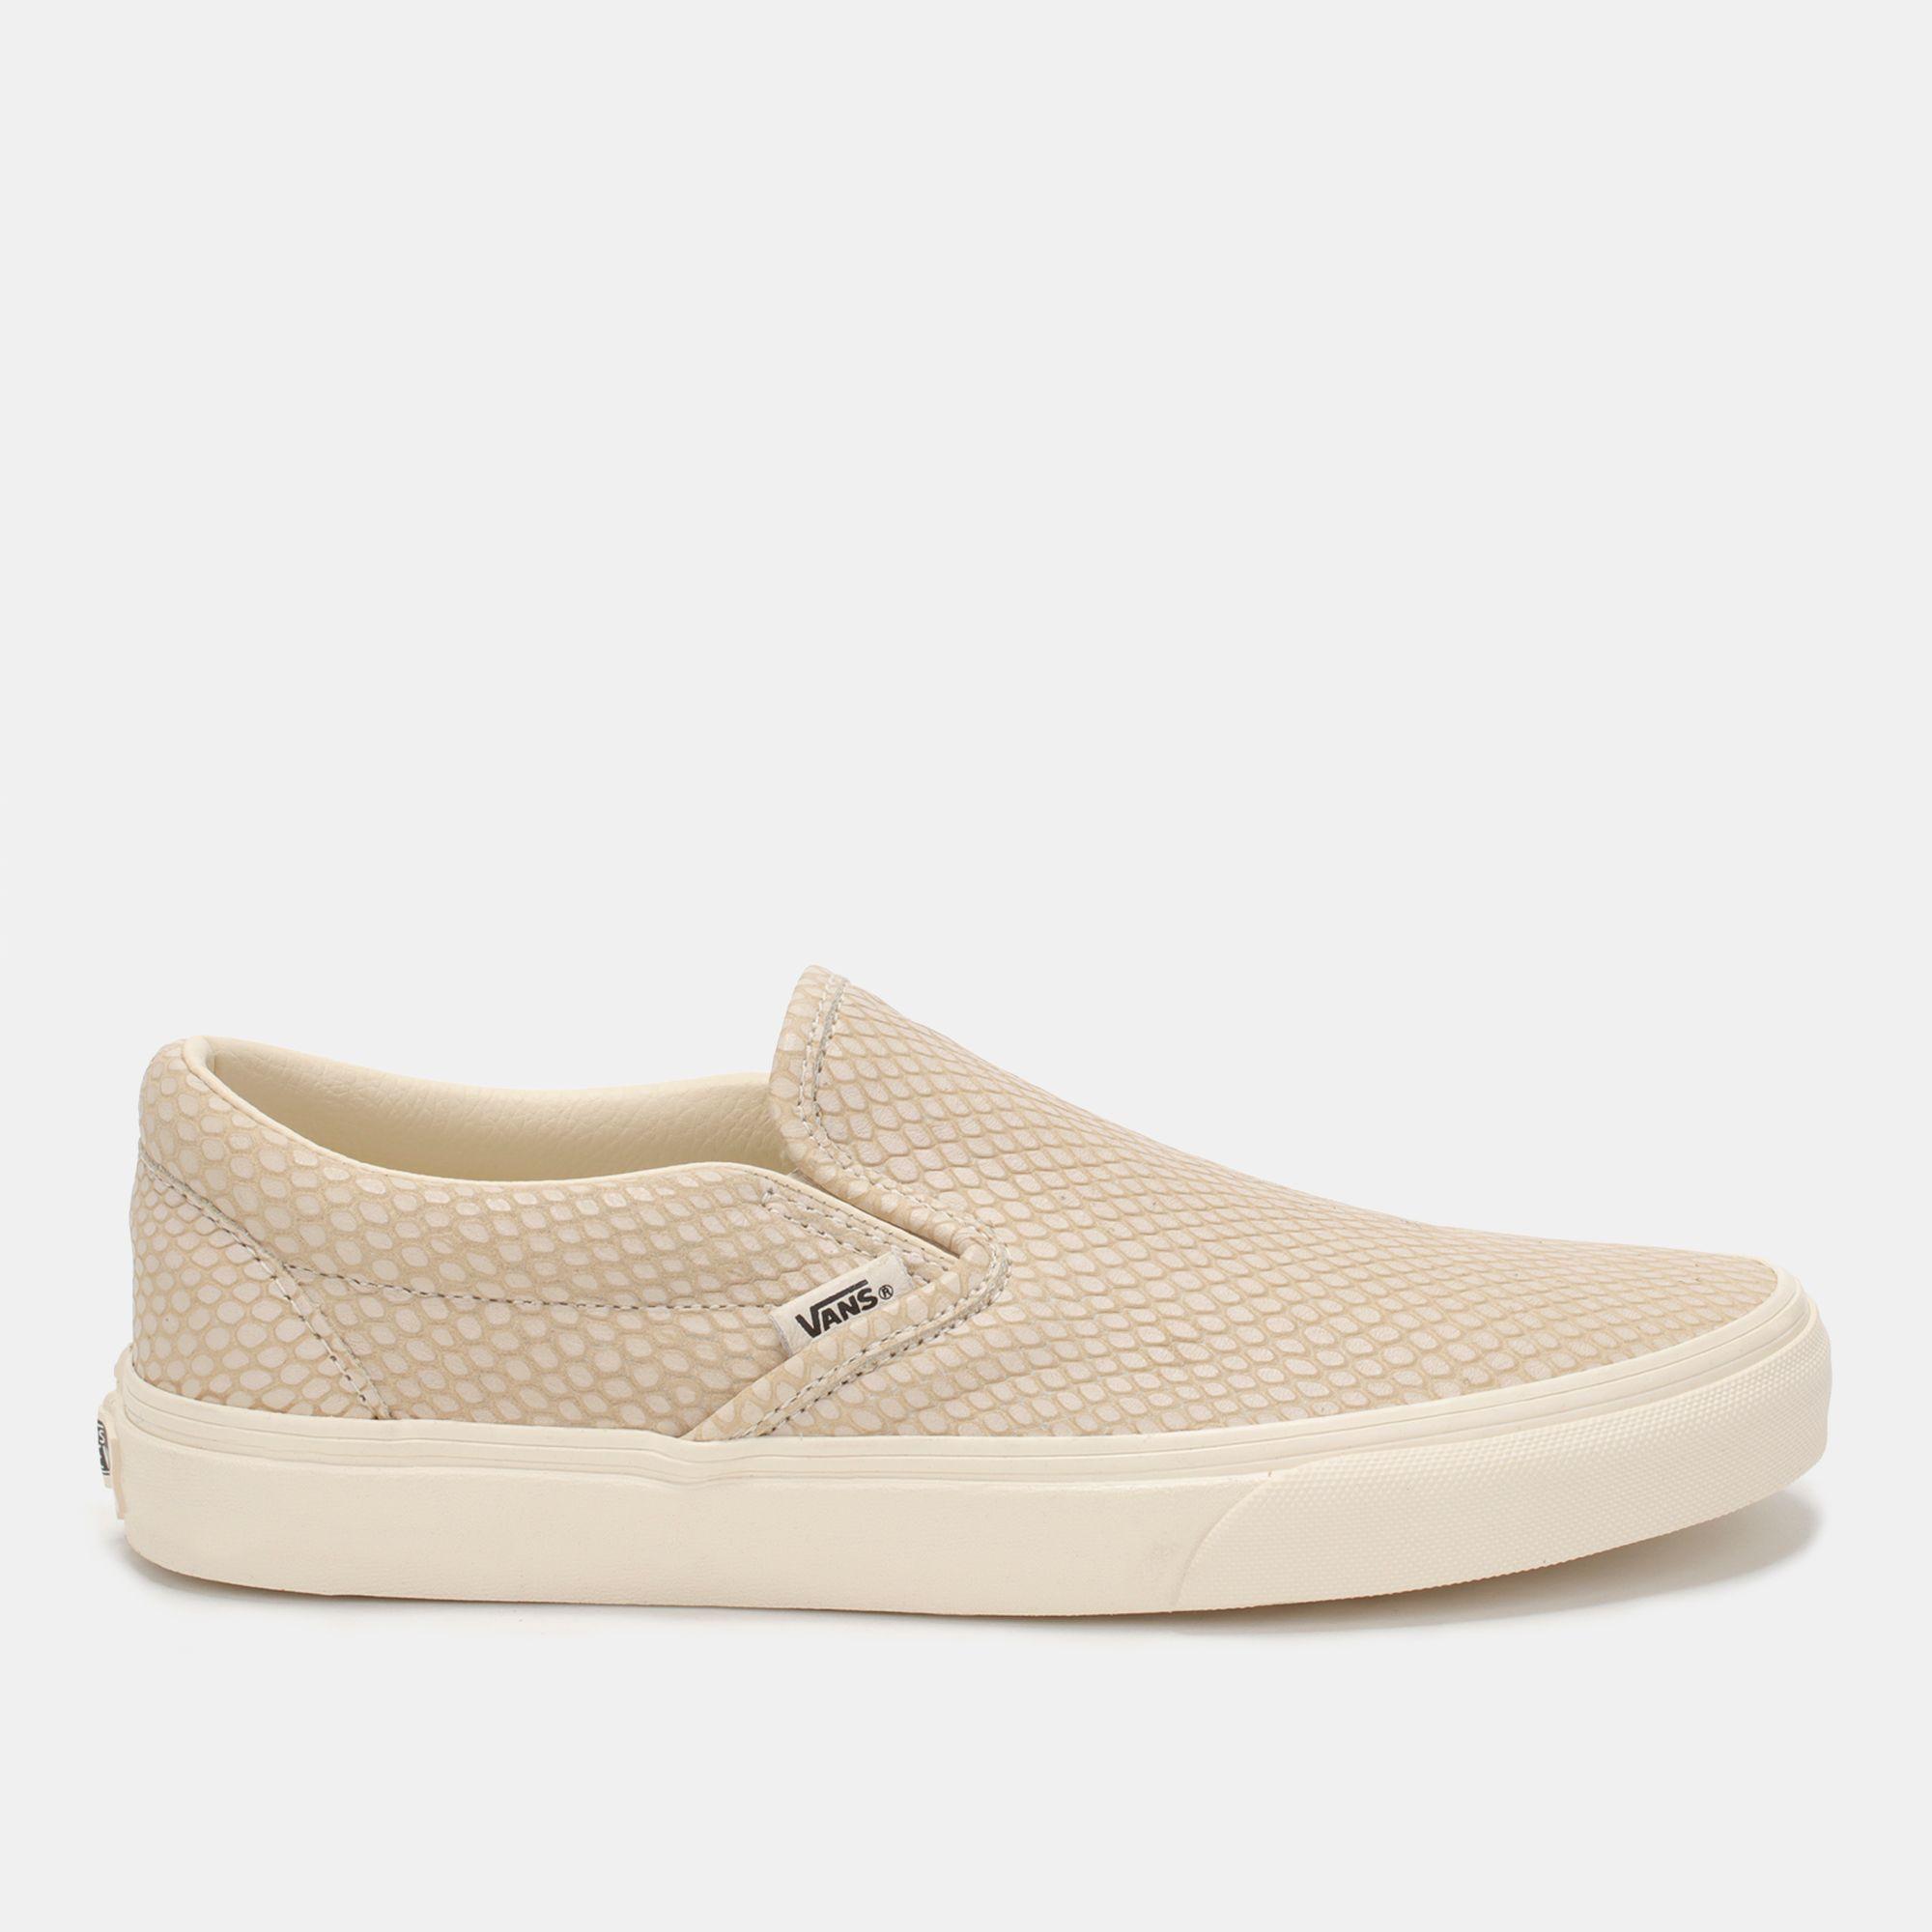 642f33484e3ece Shop Beige Vans Snake Leather Classic Slip-On Shoe for Mens by Vans ...